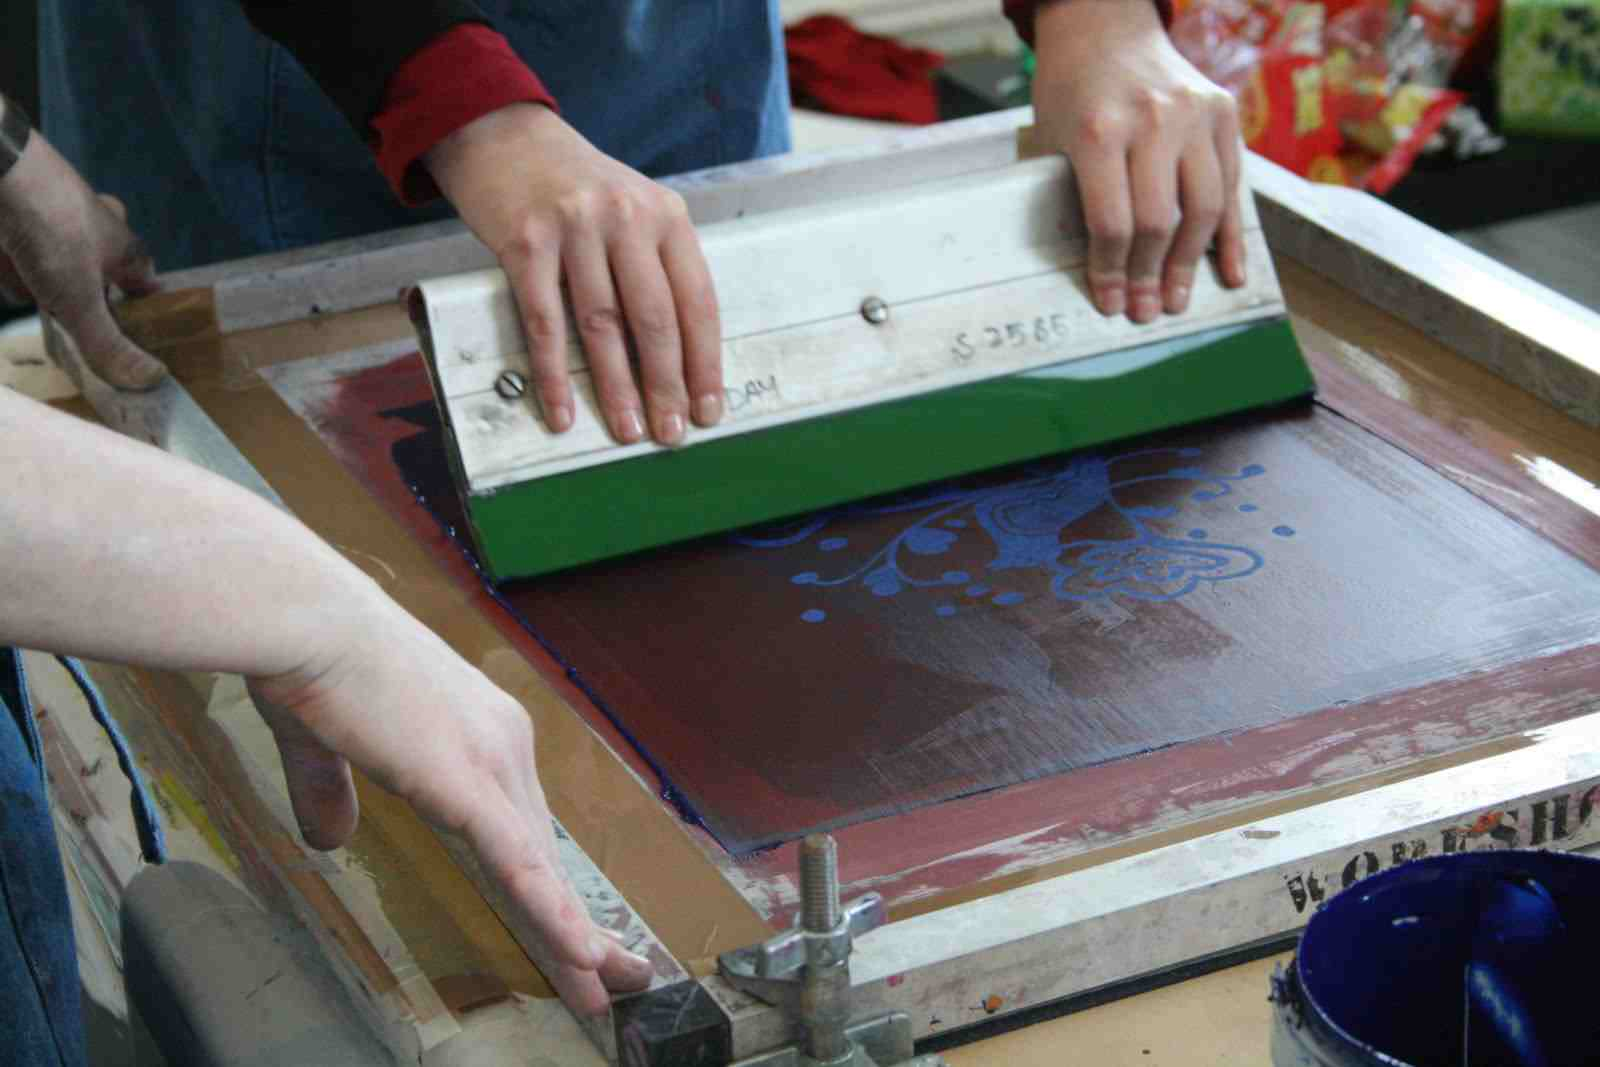 Kids Activities Screen Printing by Artea Art School Community and Party Venue